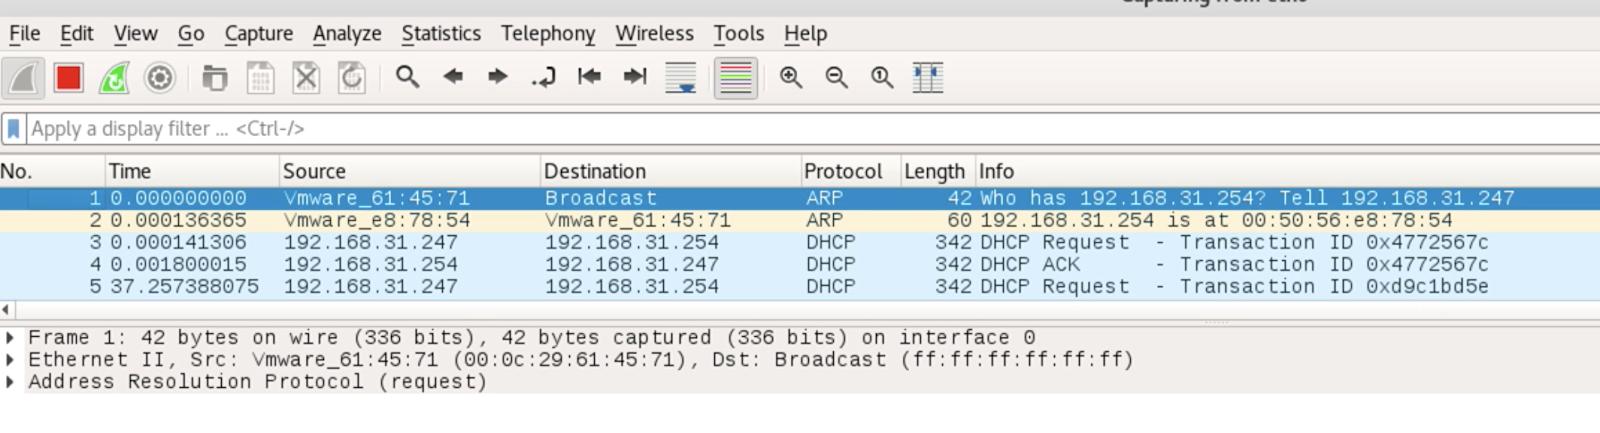 Tips for an information security analyst pentester career episode 5 wireshark basics part 1 - Wireshark filter destination port ...